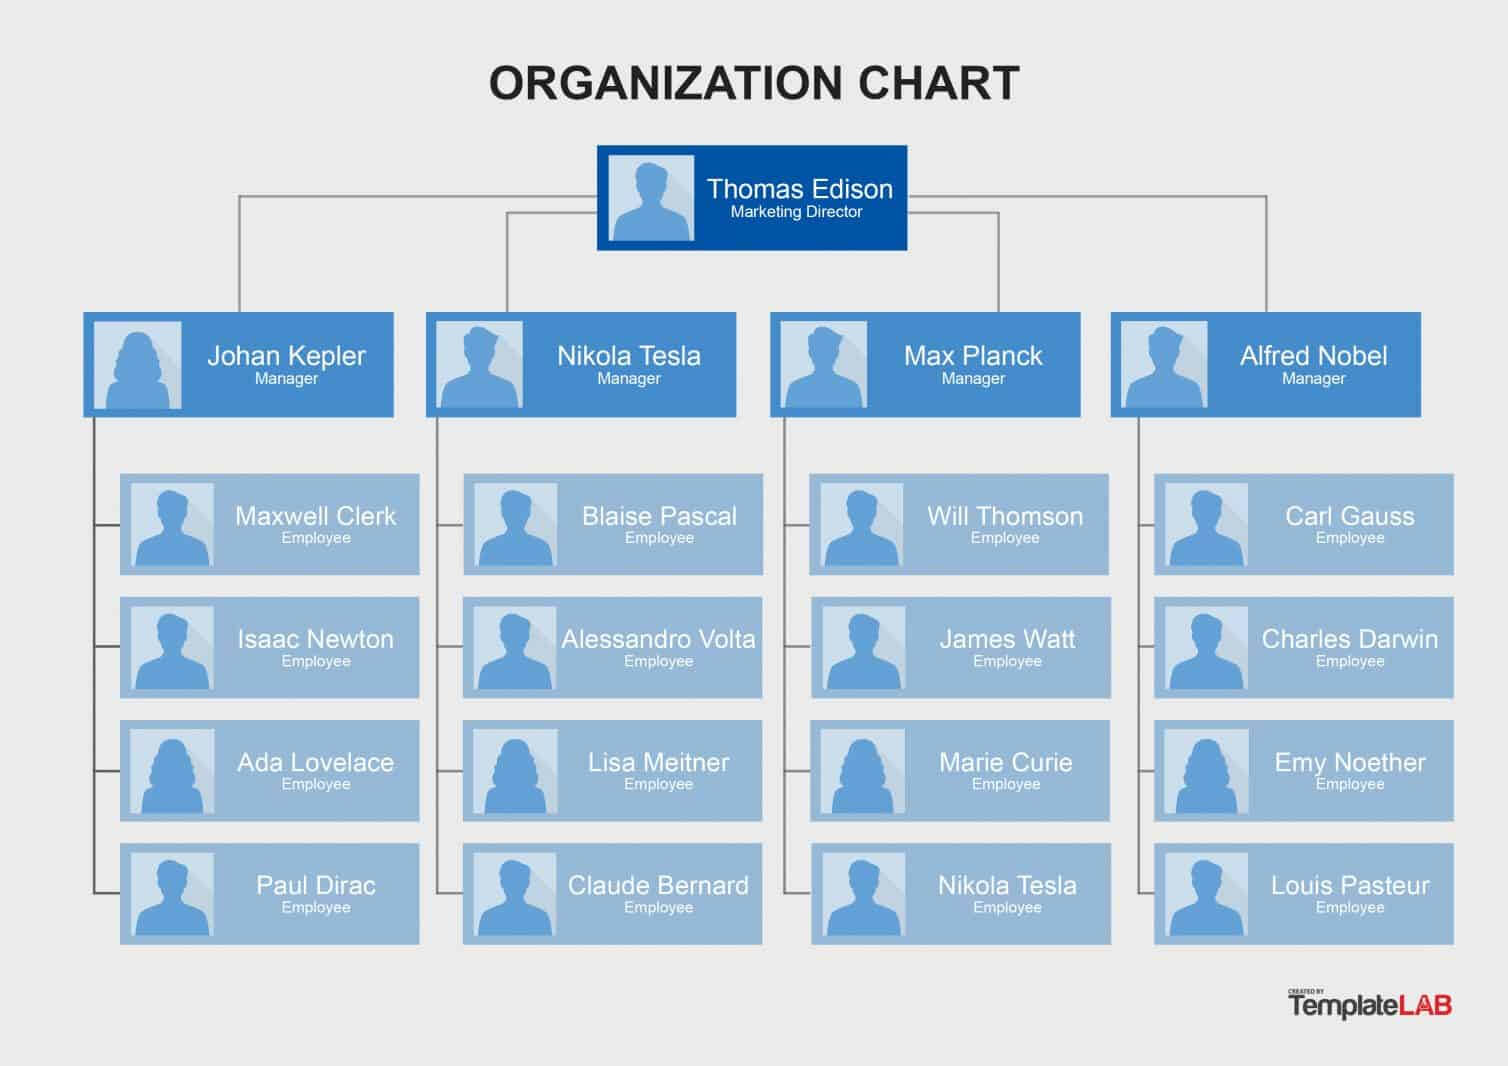 001 Organization Chart Template Templatelab Com Microsoft Intended For Organization Chart Template Word